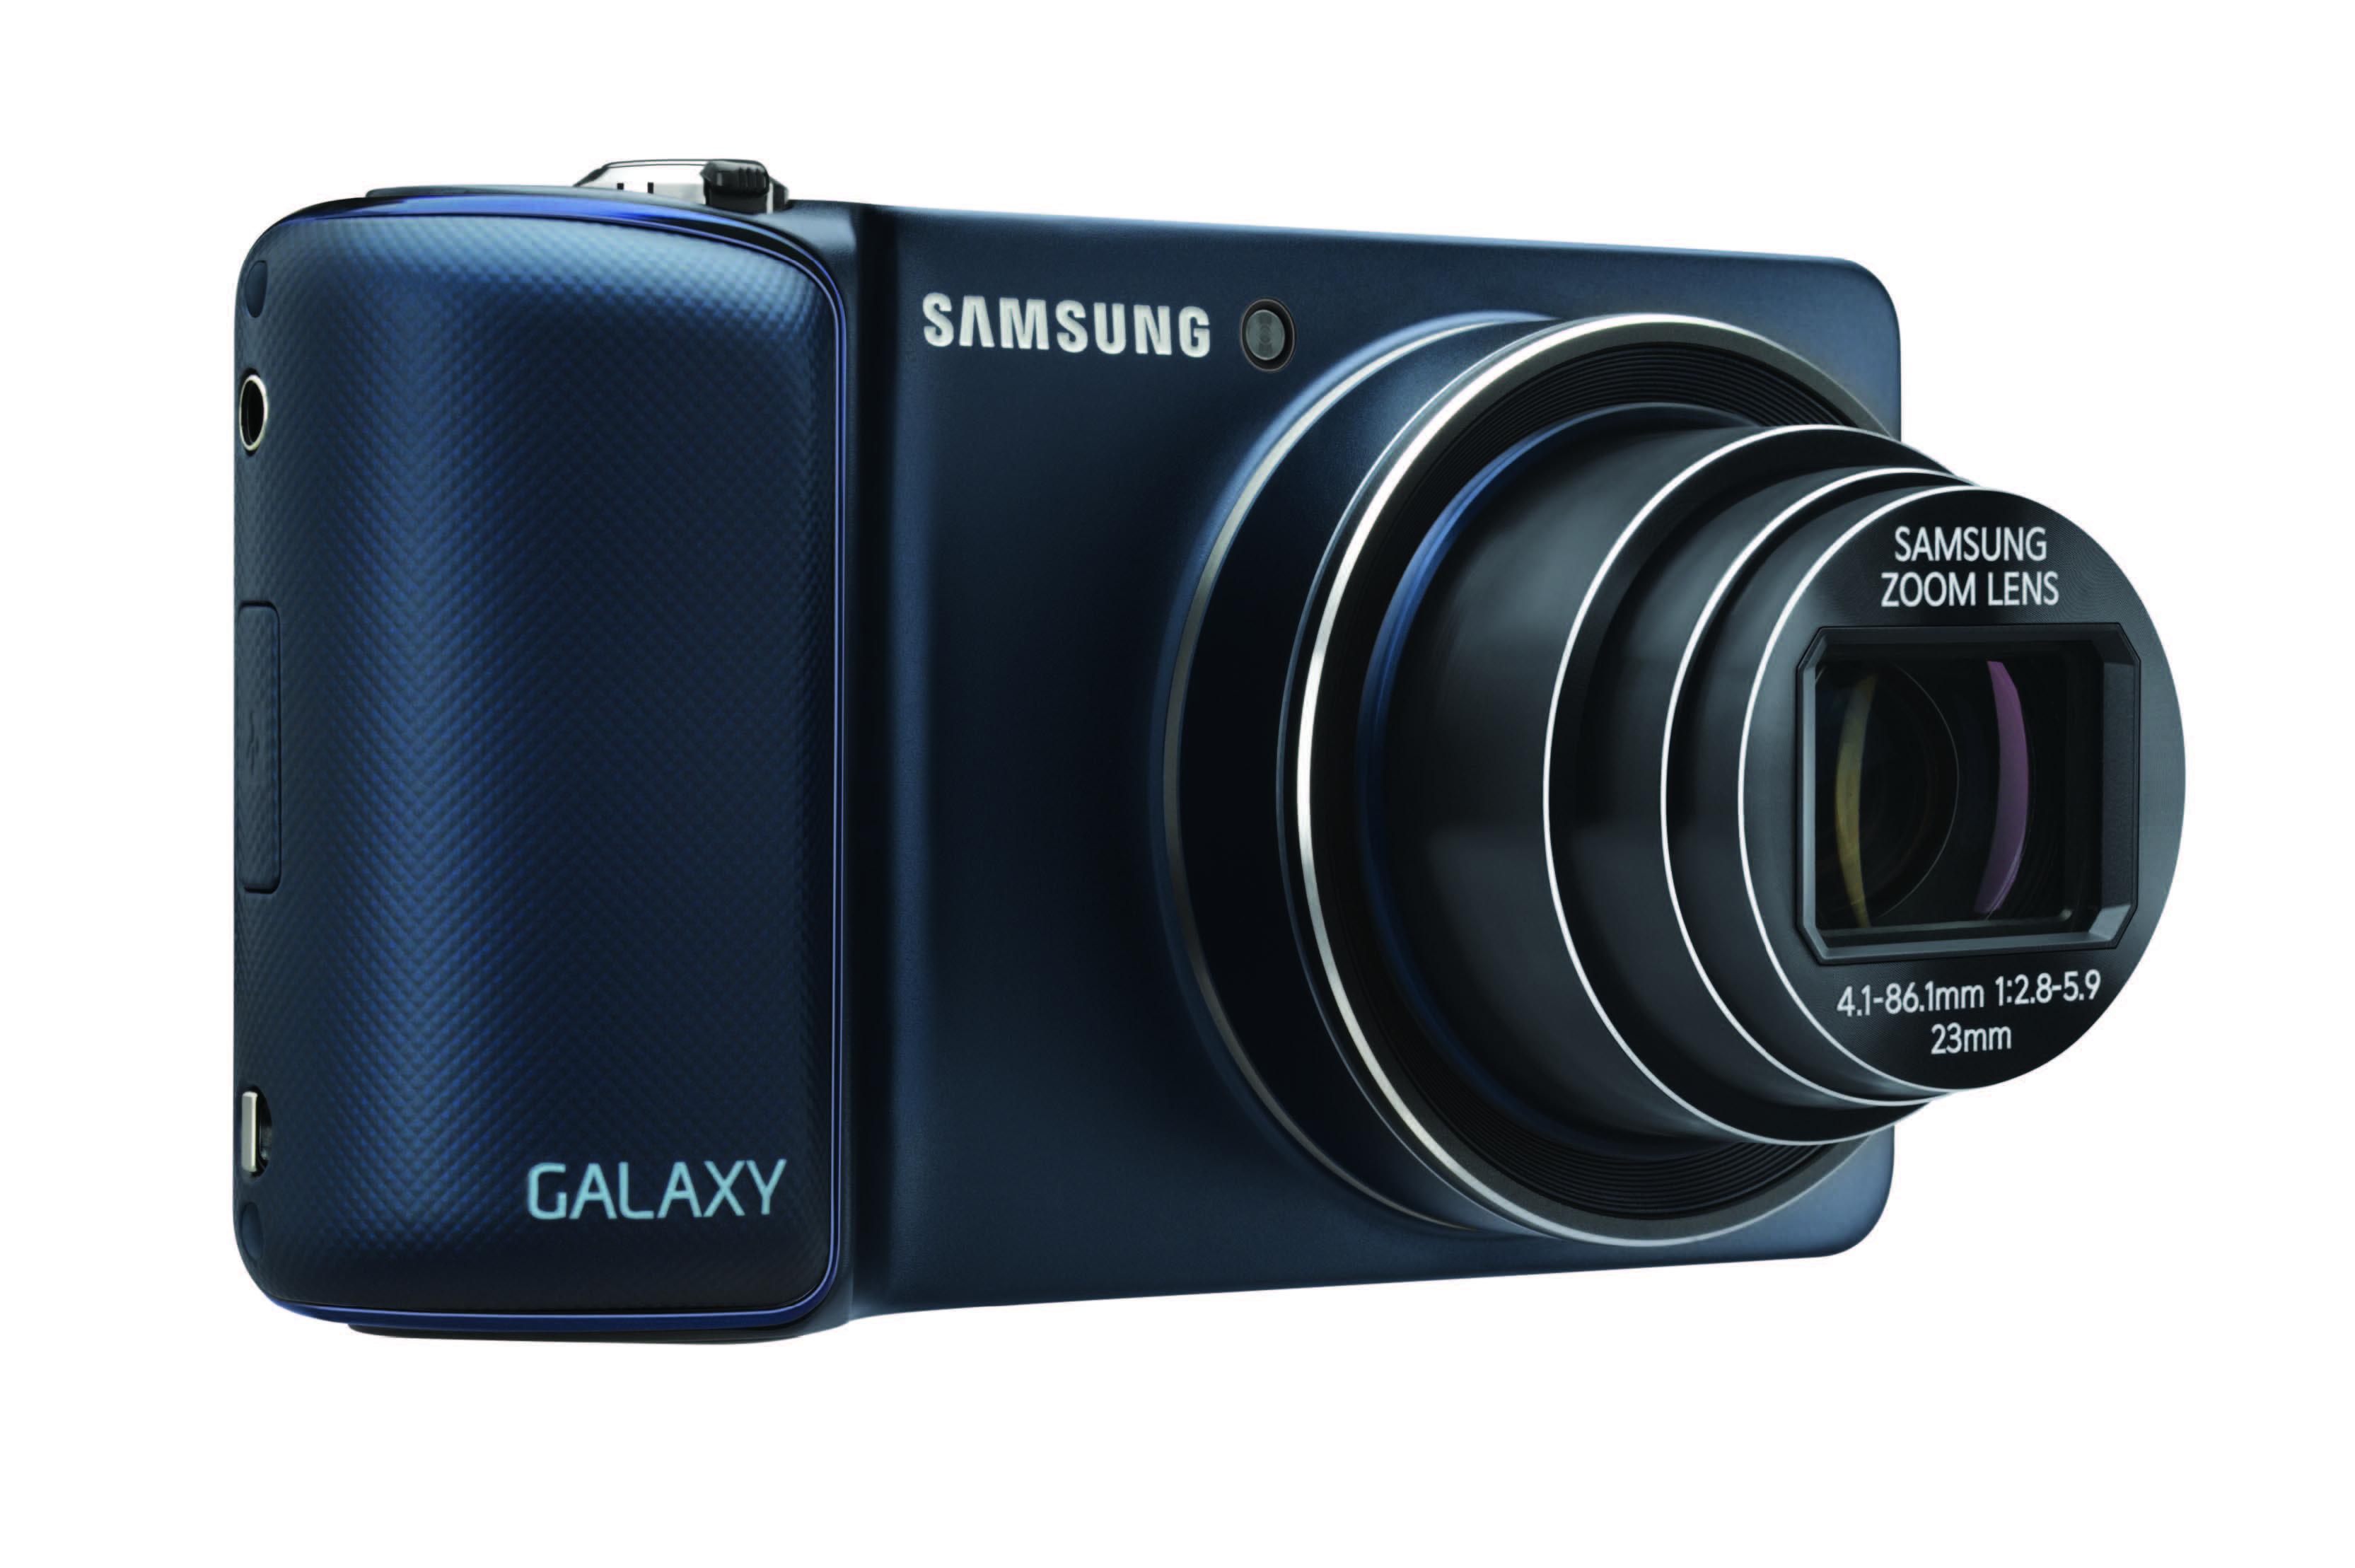 verizon galaxy camera arrives december 13 with 549 sticker